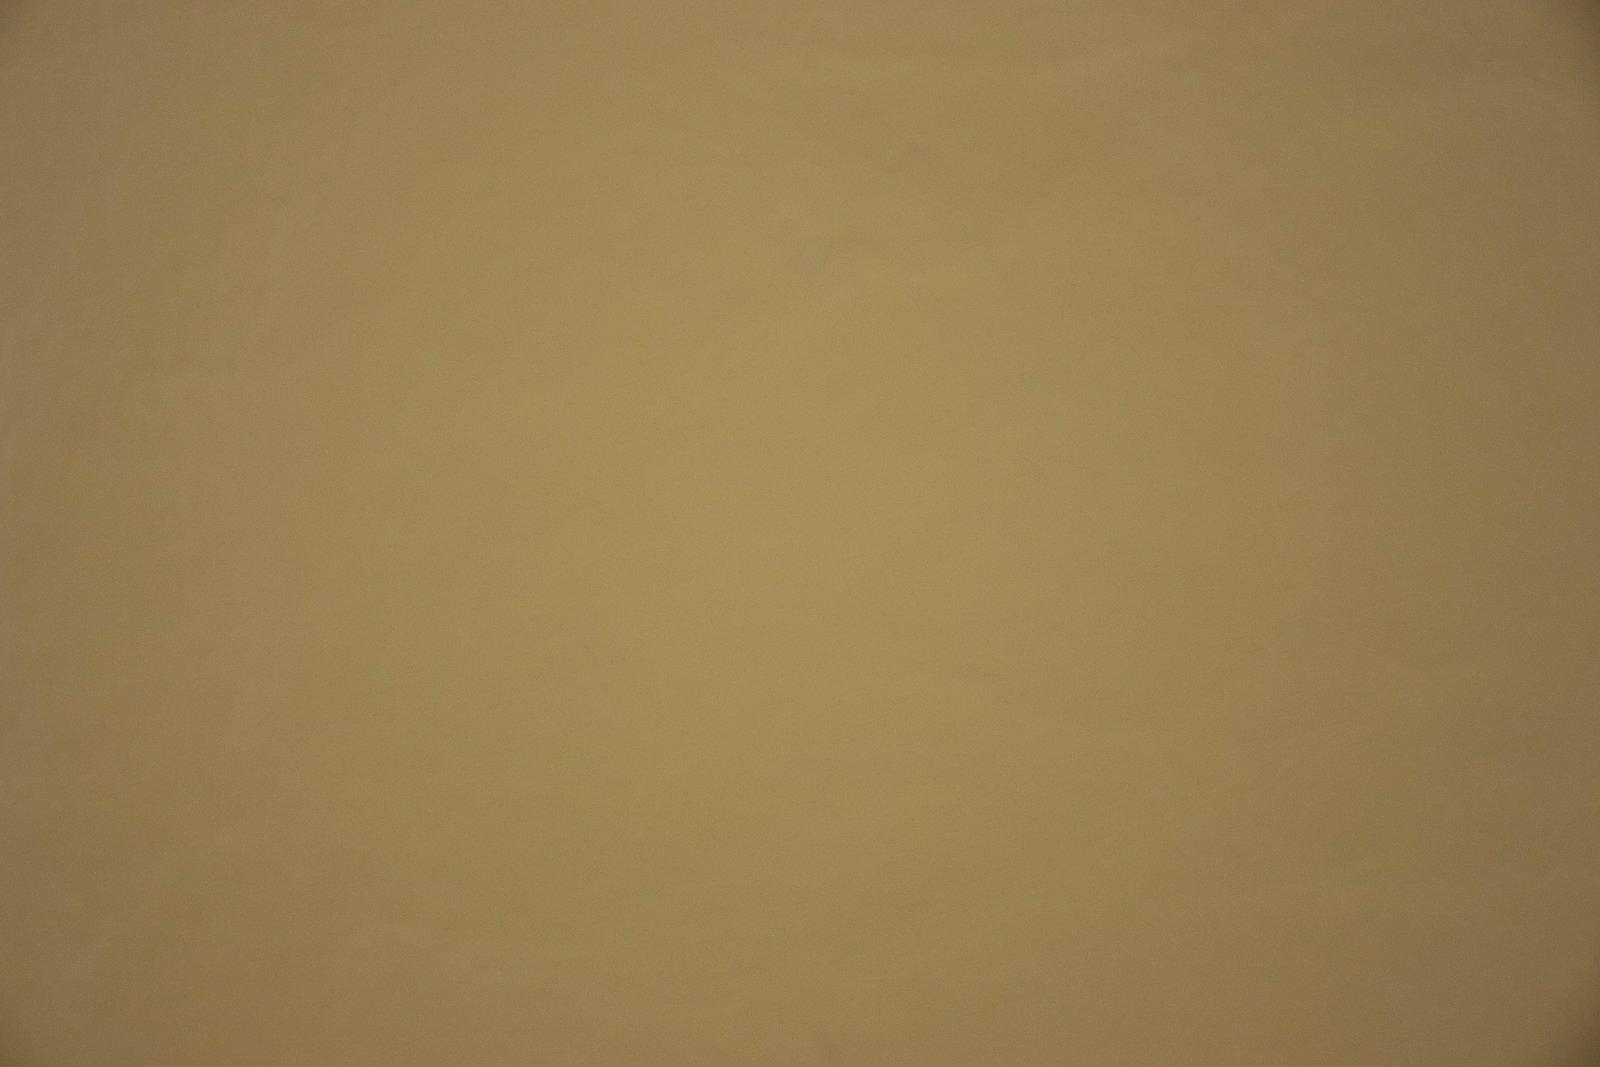 Bry-Tech Marine1 Marine Vinyl Upholstery Fabric Very Dark Tan 54'' Wide by 10 Yards Boat Auto